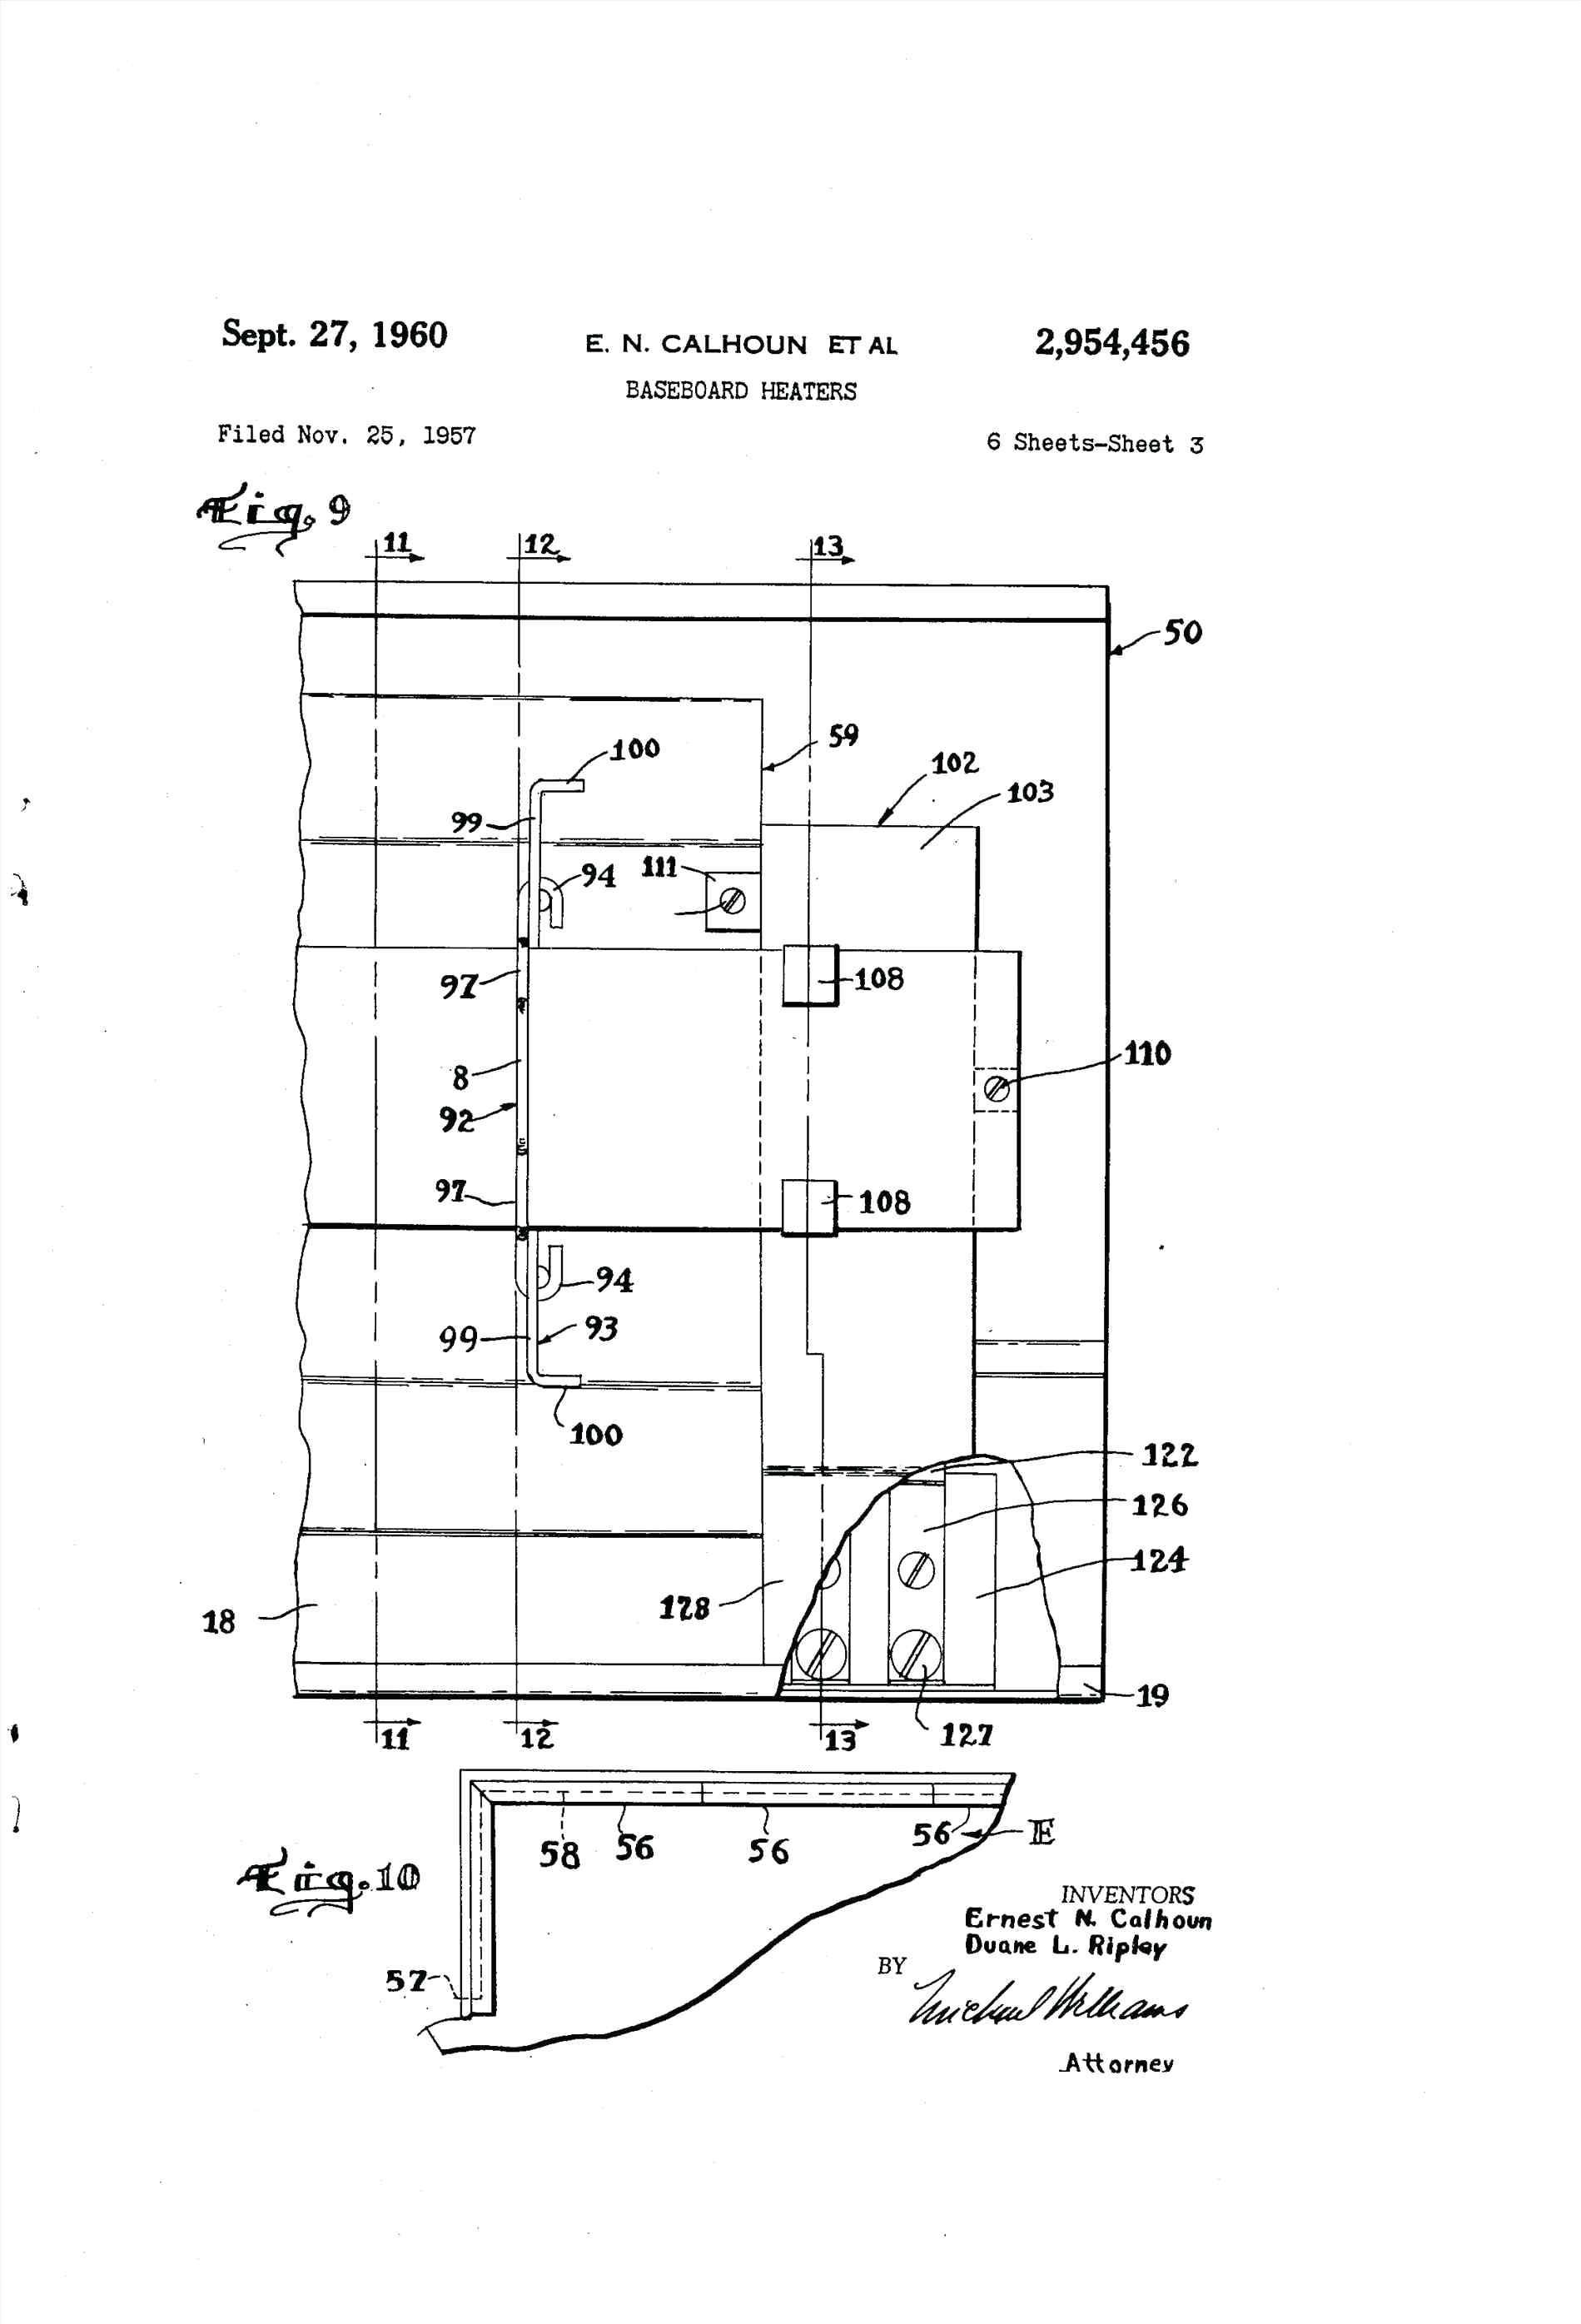 Electric Baseboard Heater Wiring Diagram